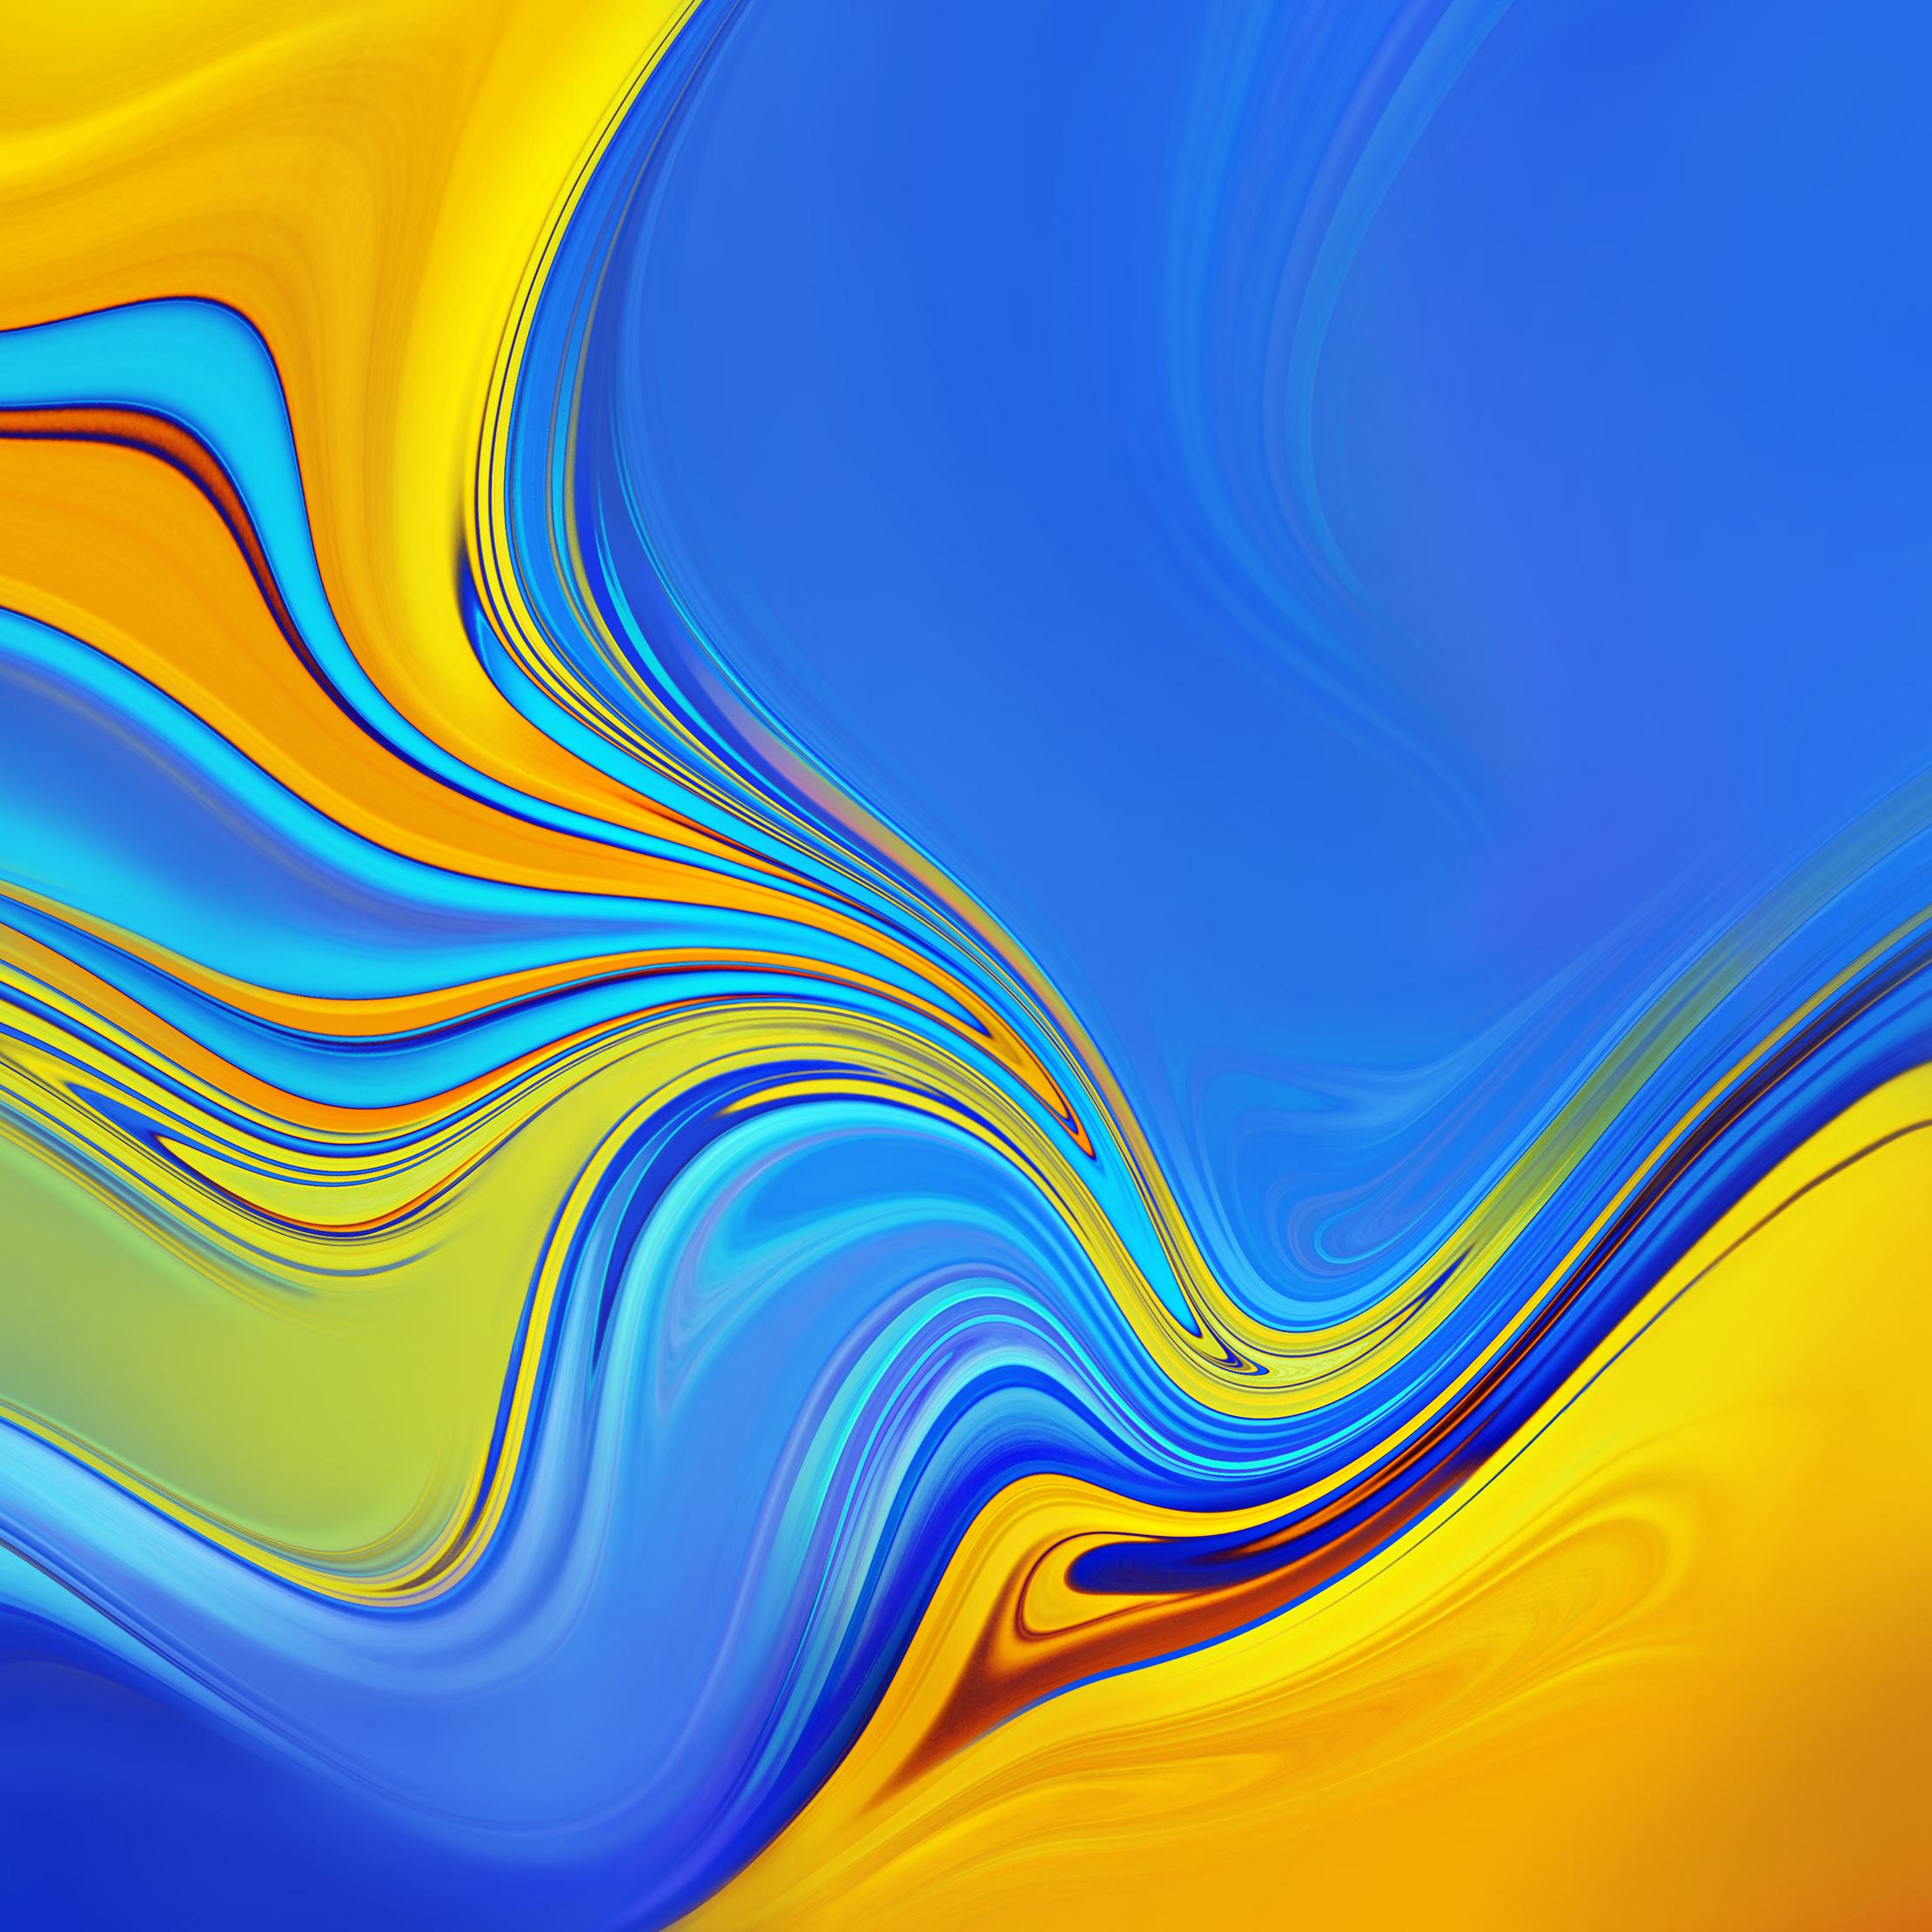 Samsung Galaxy M10 Wallpapers   Top Samsung Galaxy M10 2220x2220